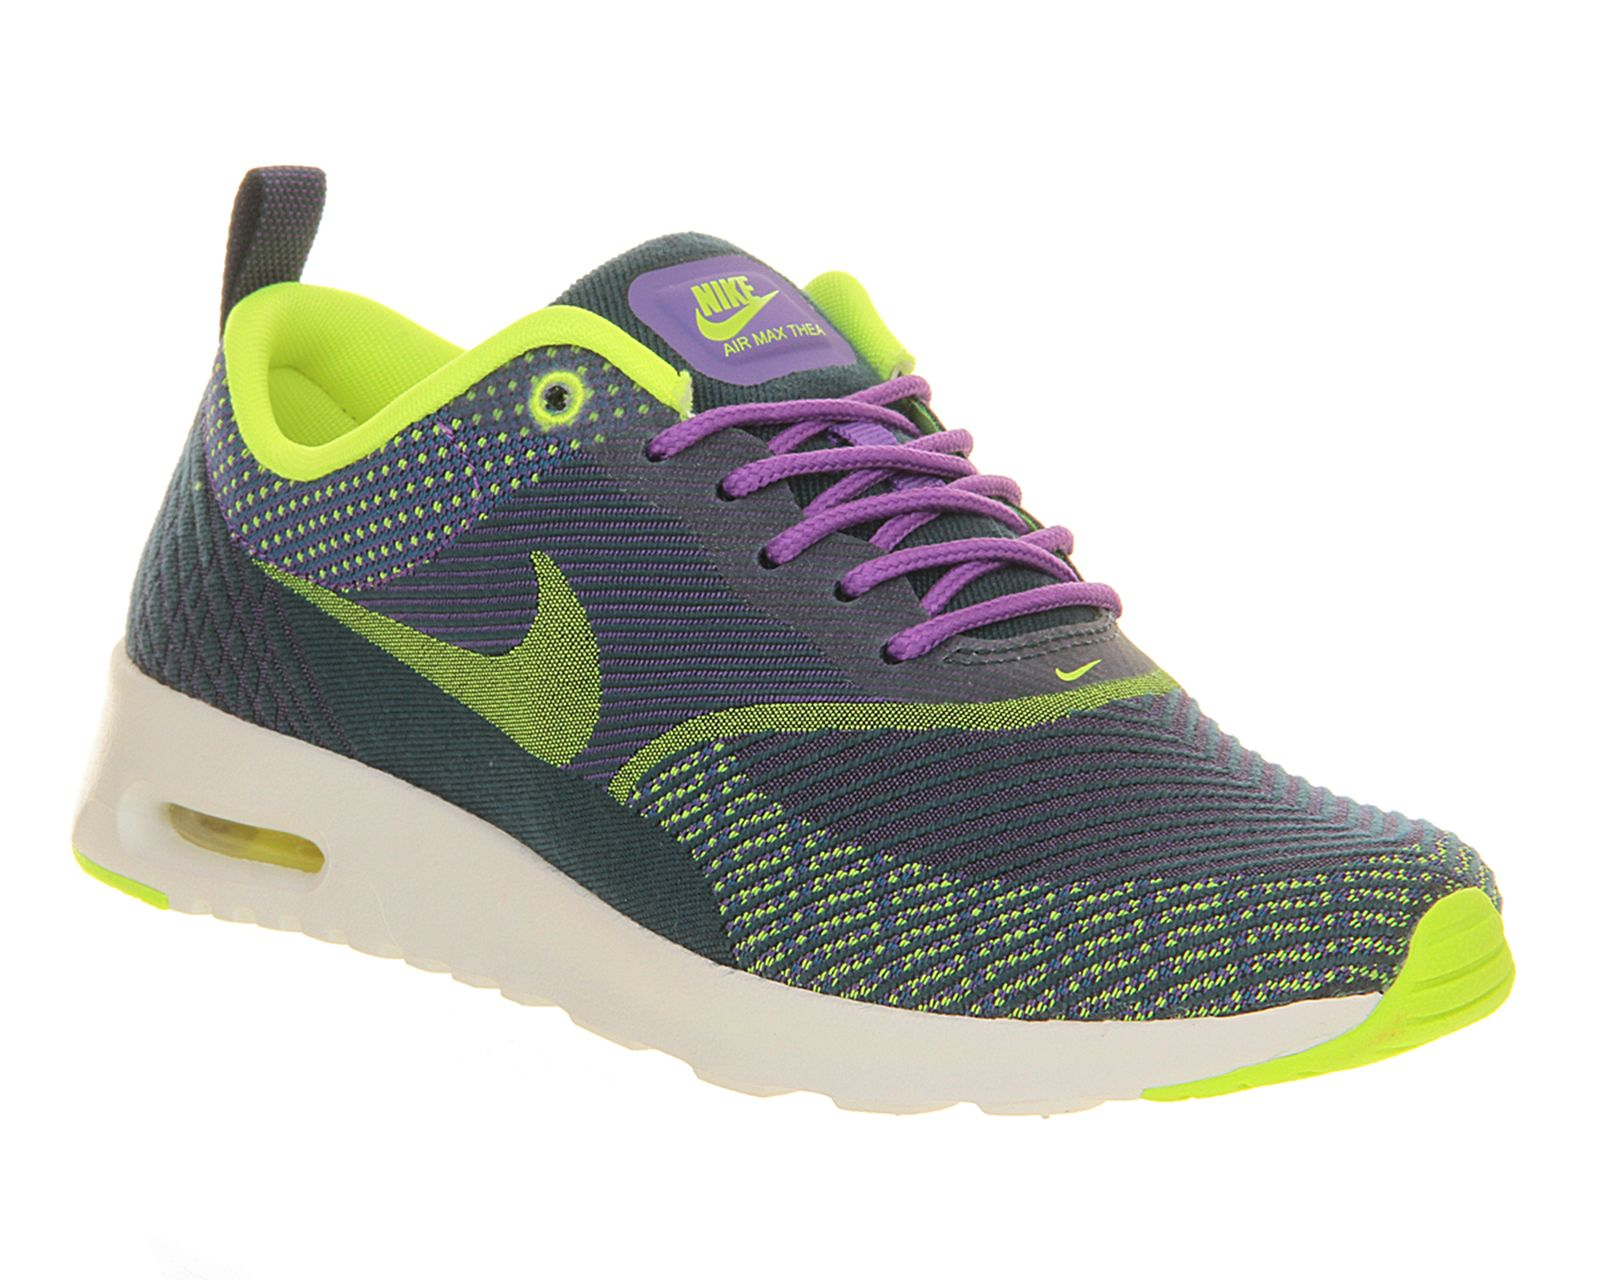 Nike Air Max Thea Hyper Grape Jacquard Hers trainers Wardrobe